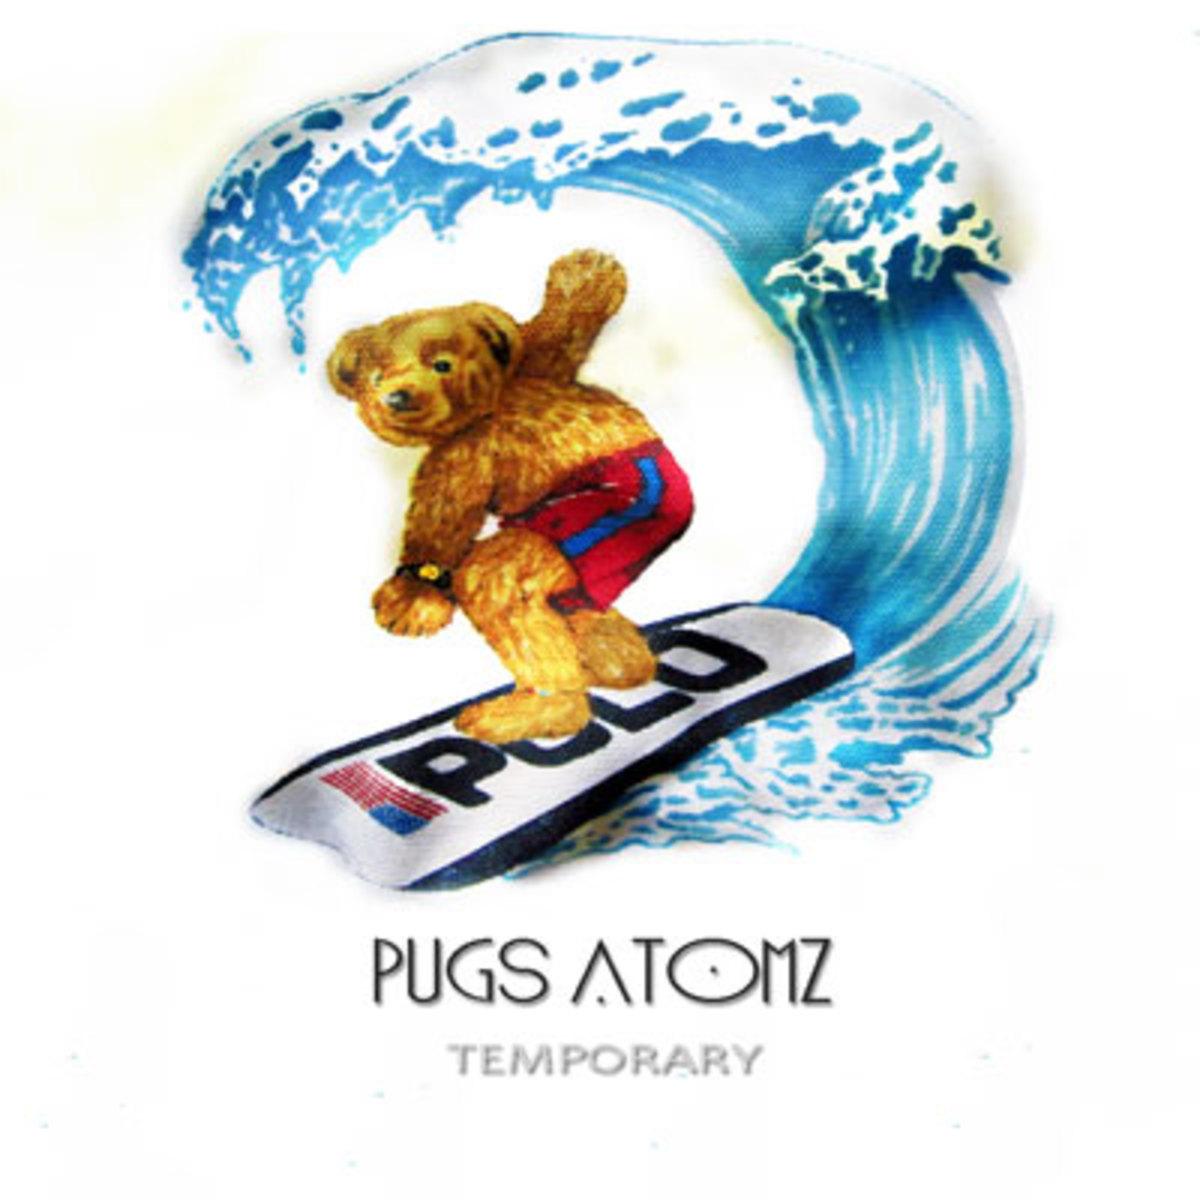 pugsatomz-temporary.jpg